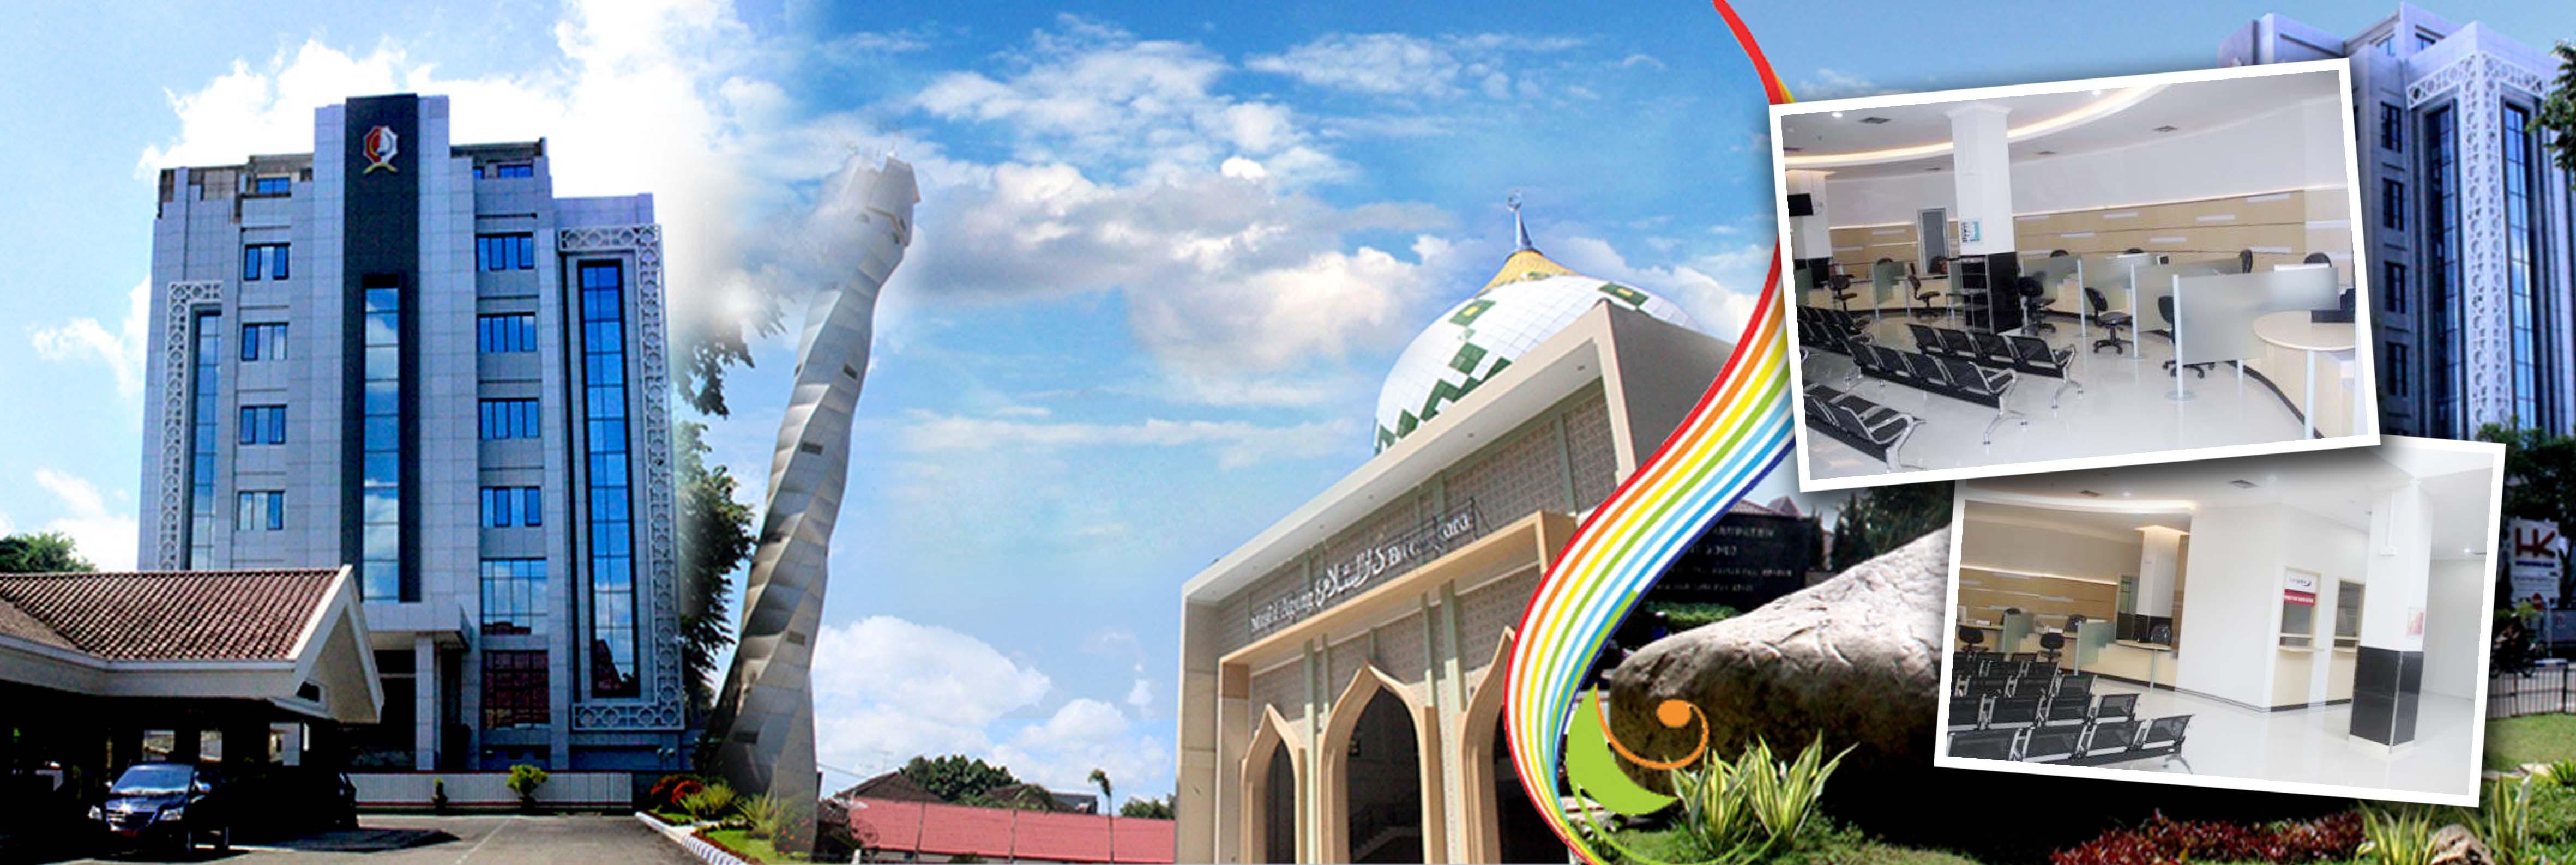 Kantor Dinas Penanaman Modal Dan PTSP<BR>Jl. P. Mas Tumapel No. 1 Bojonegoro